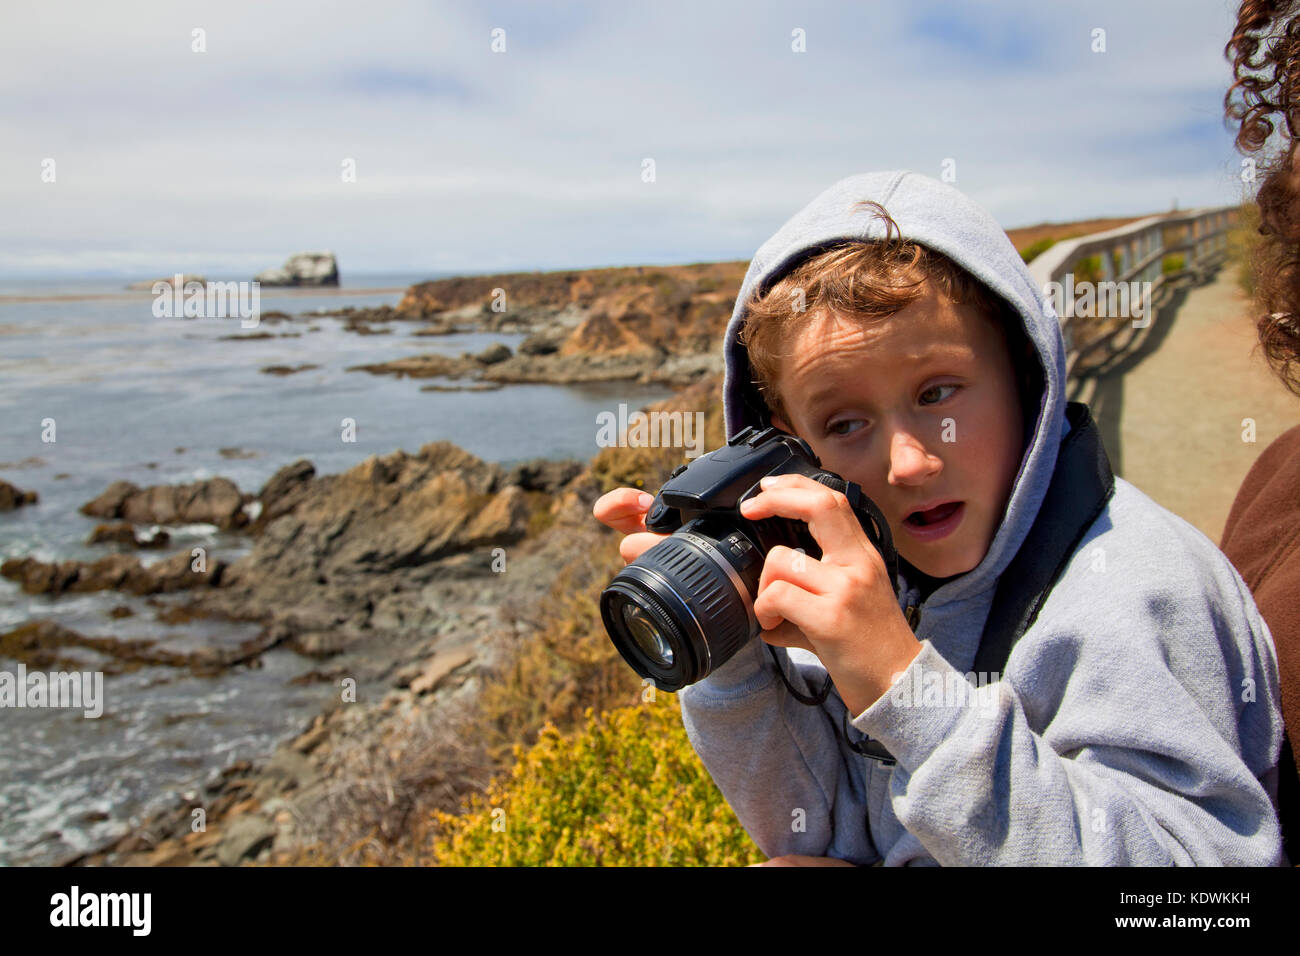 Young boy taking photos with a camera, San Simeon, San Luis Obispo County, California, USA (MR) - Stock Image